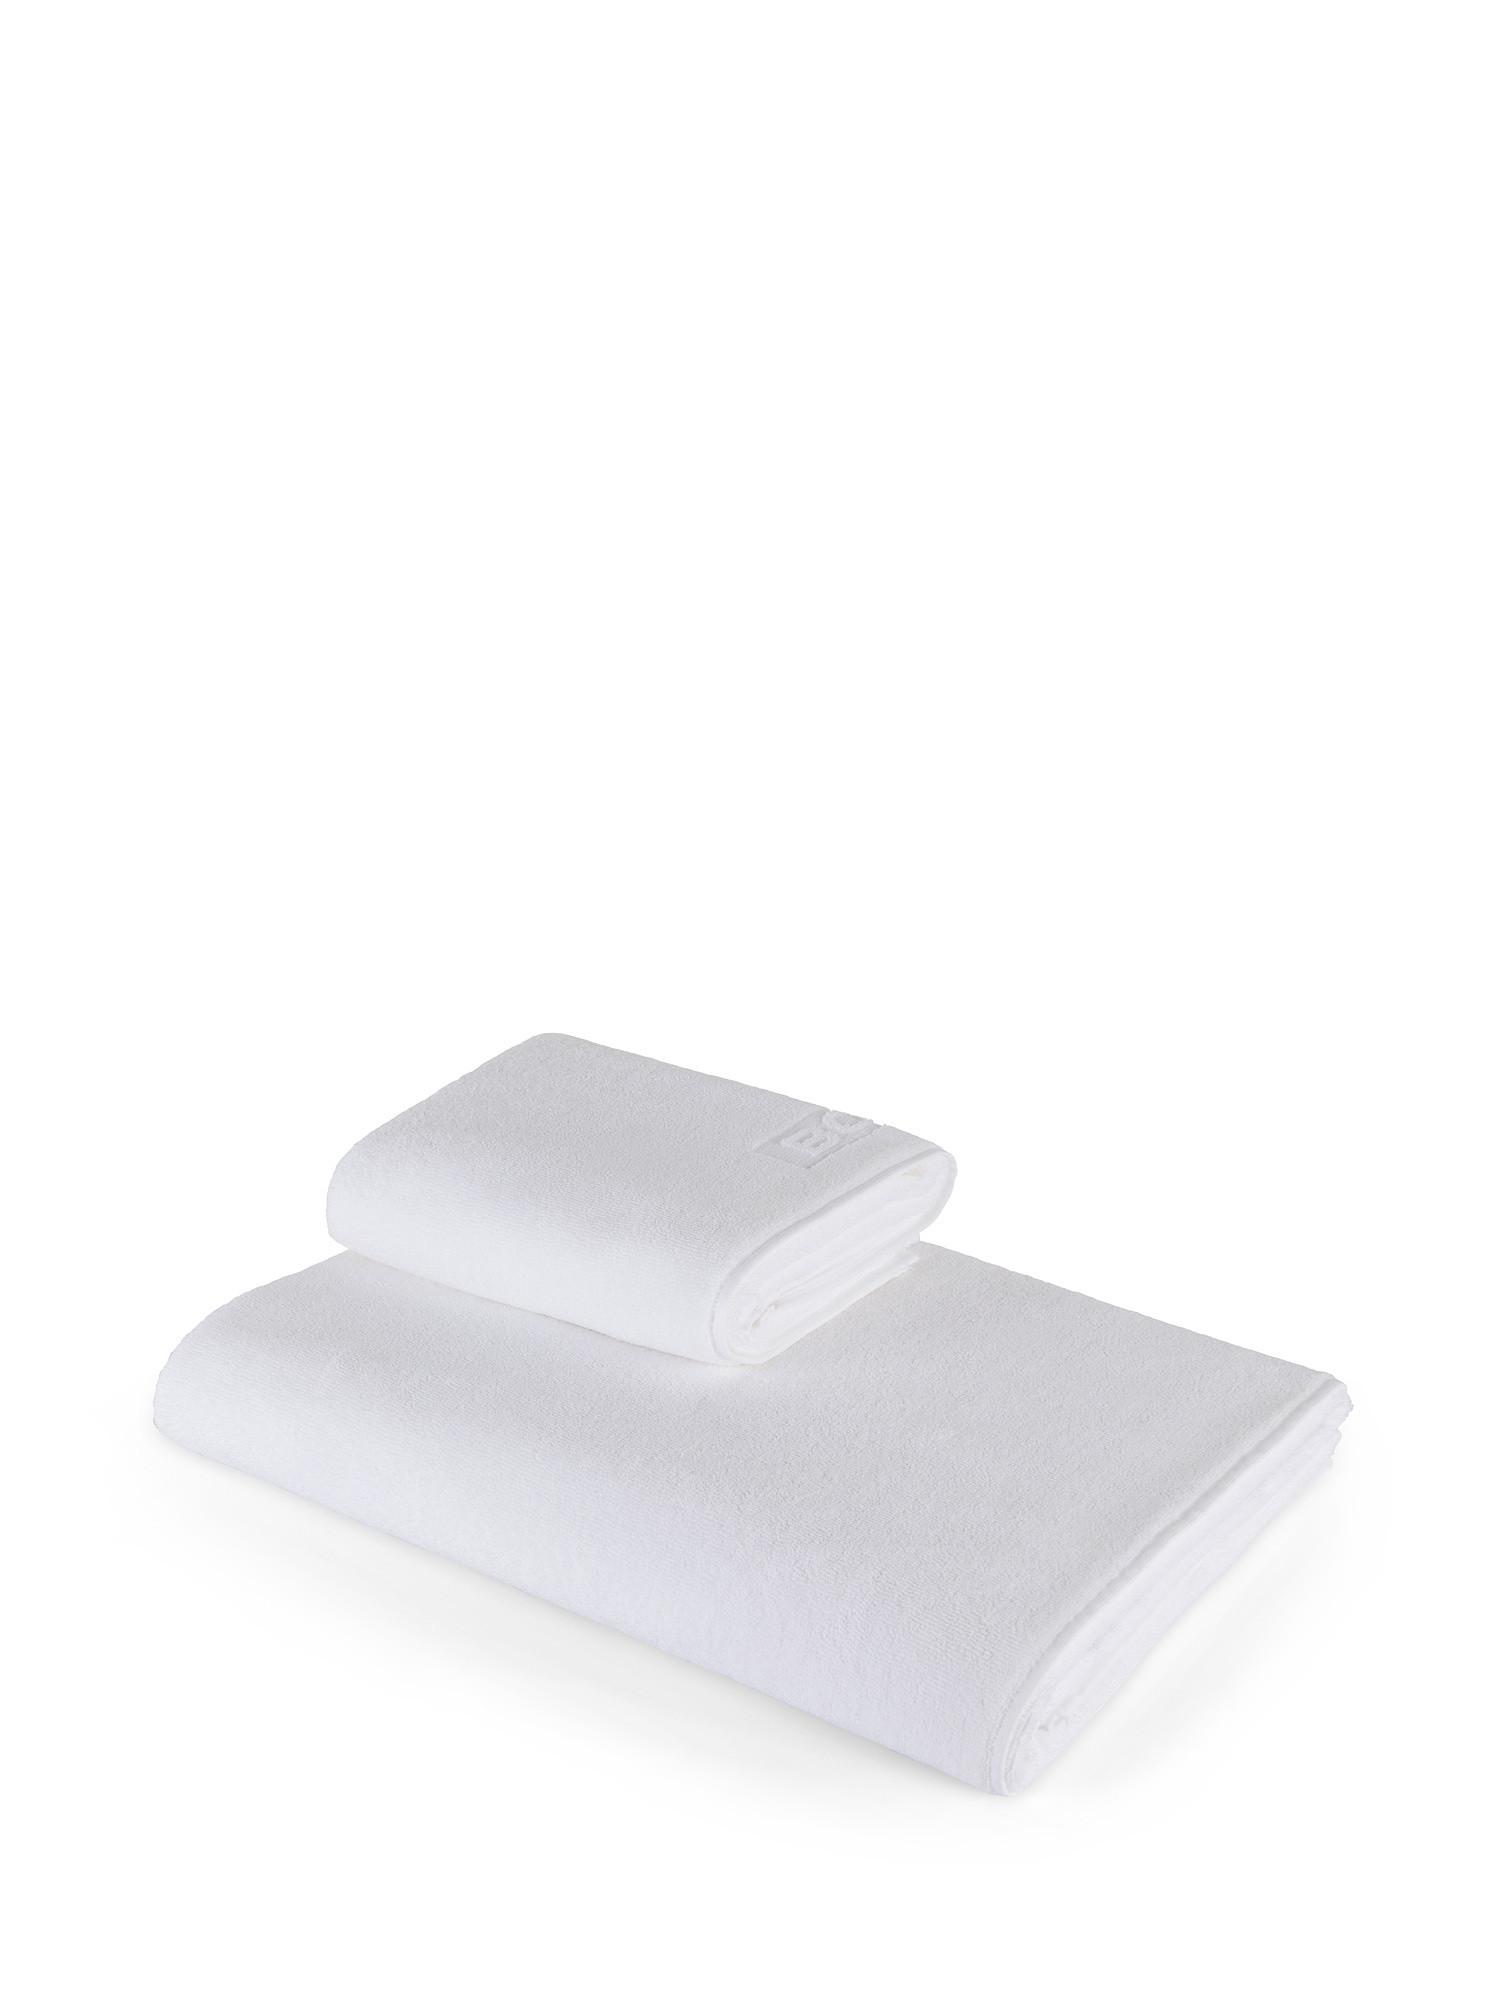 Asciugamano capelli spugna di cotone tinta unita, Bianco, large image number 0